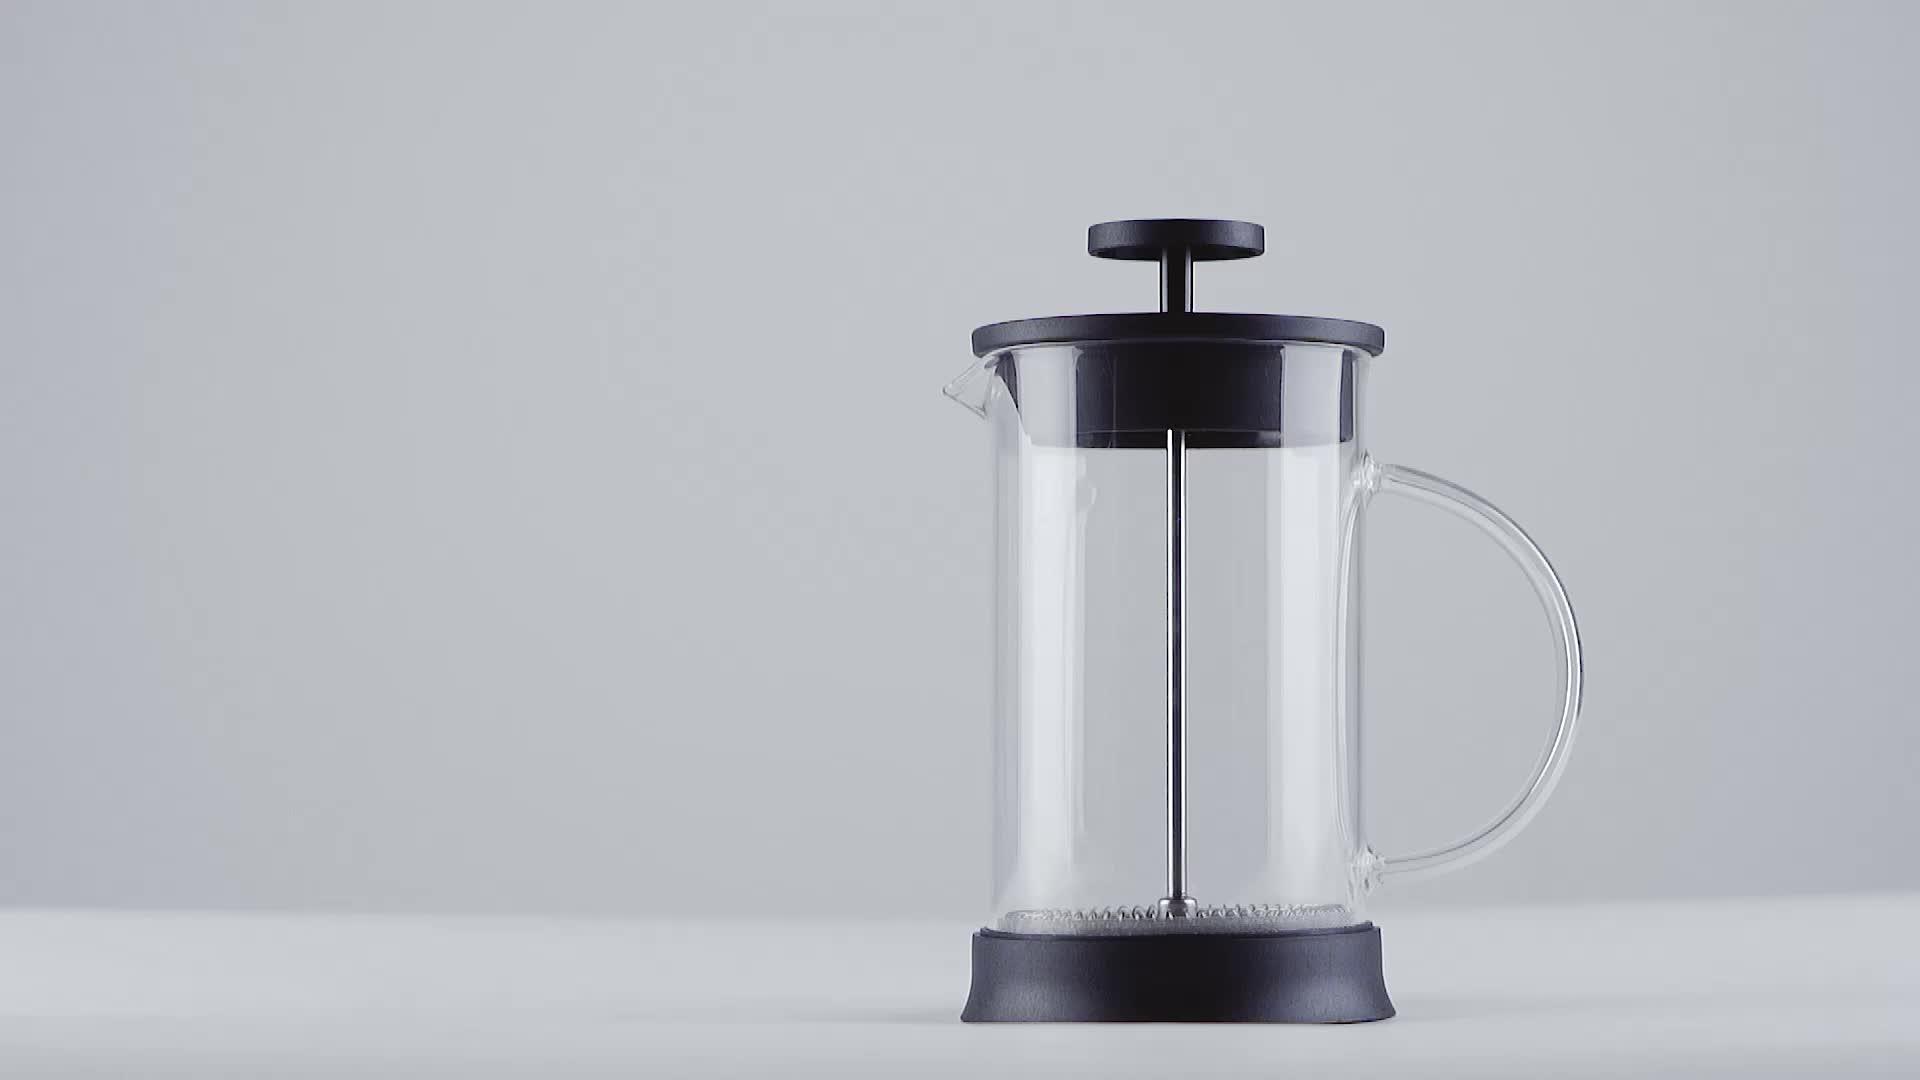 Amazon Rvs Borosilicaatglas Koffie Franse Pers Pot/Koffiezetapparaat/Thee Brouwen